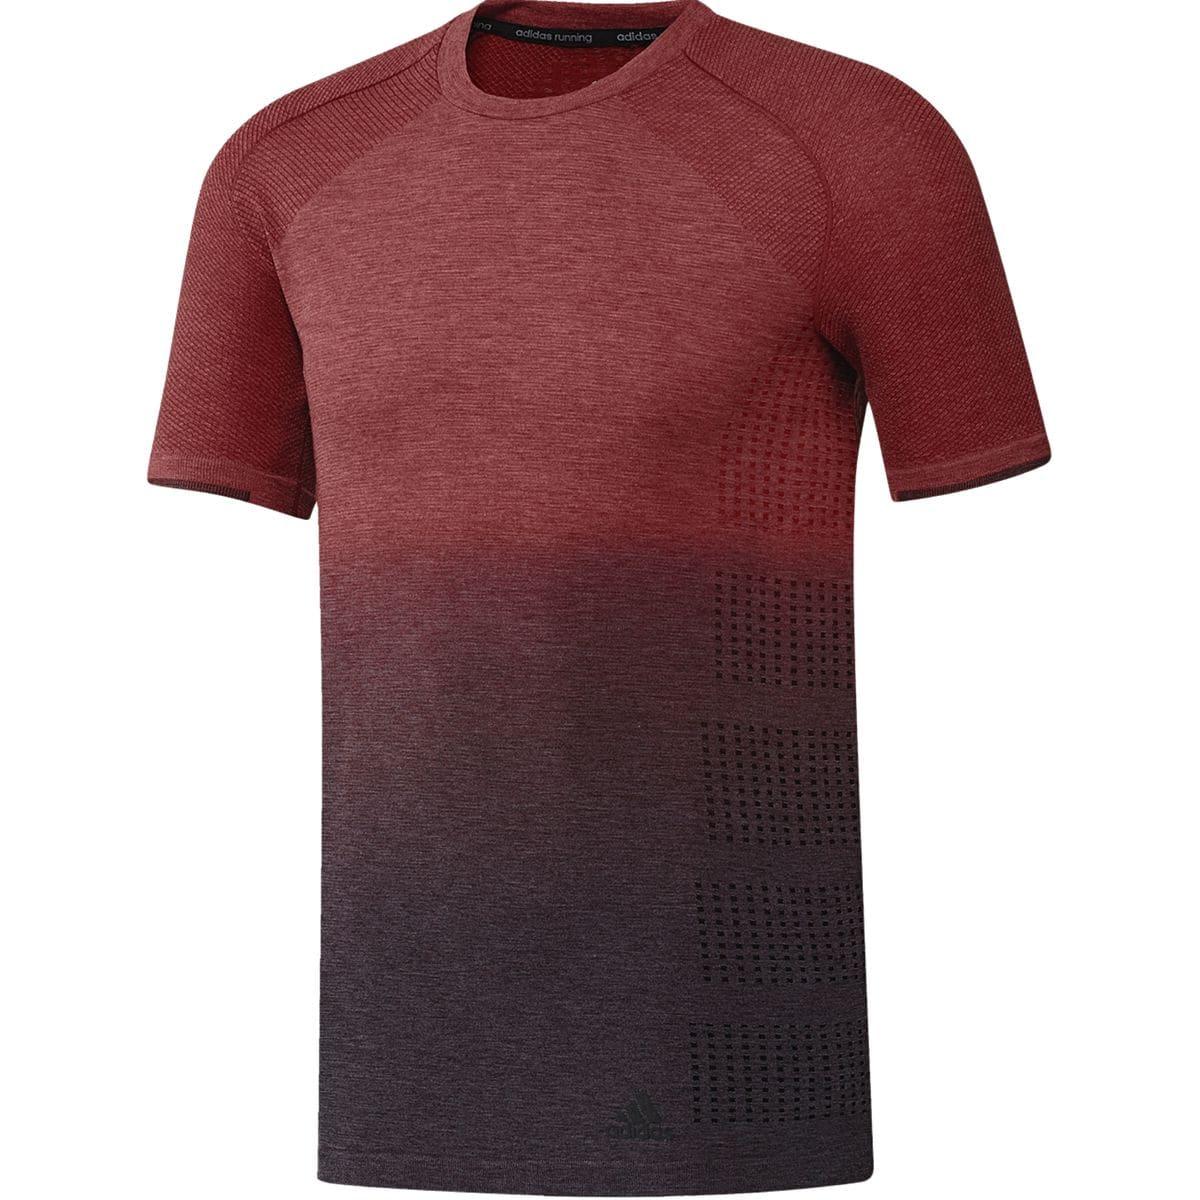 Adidas Primeknit Dip-Dye T-Shirt - Men